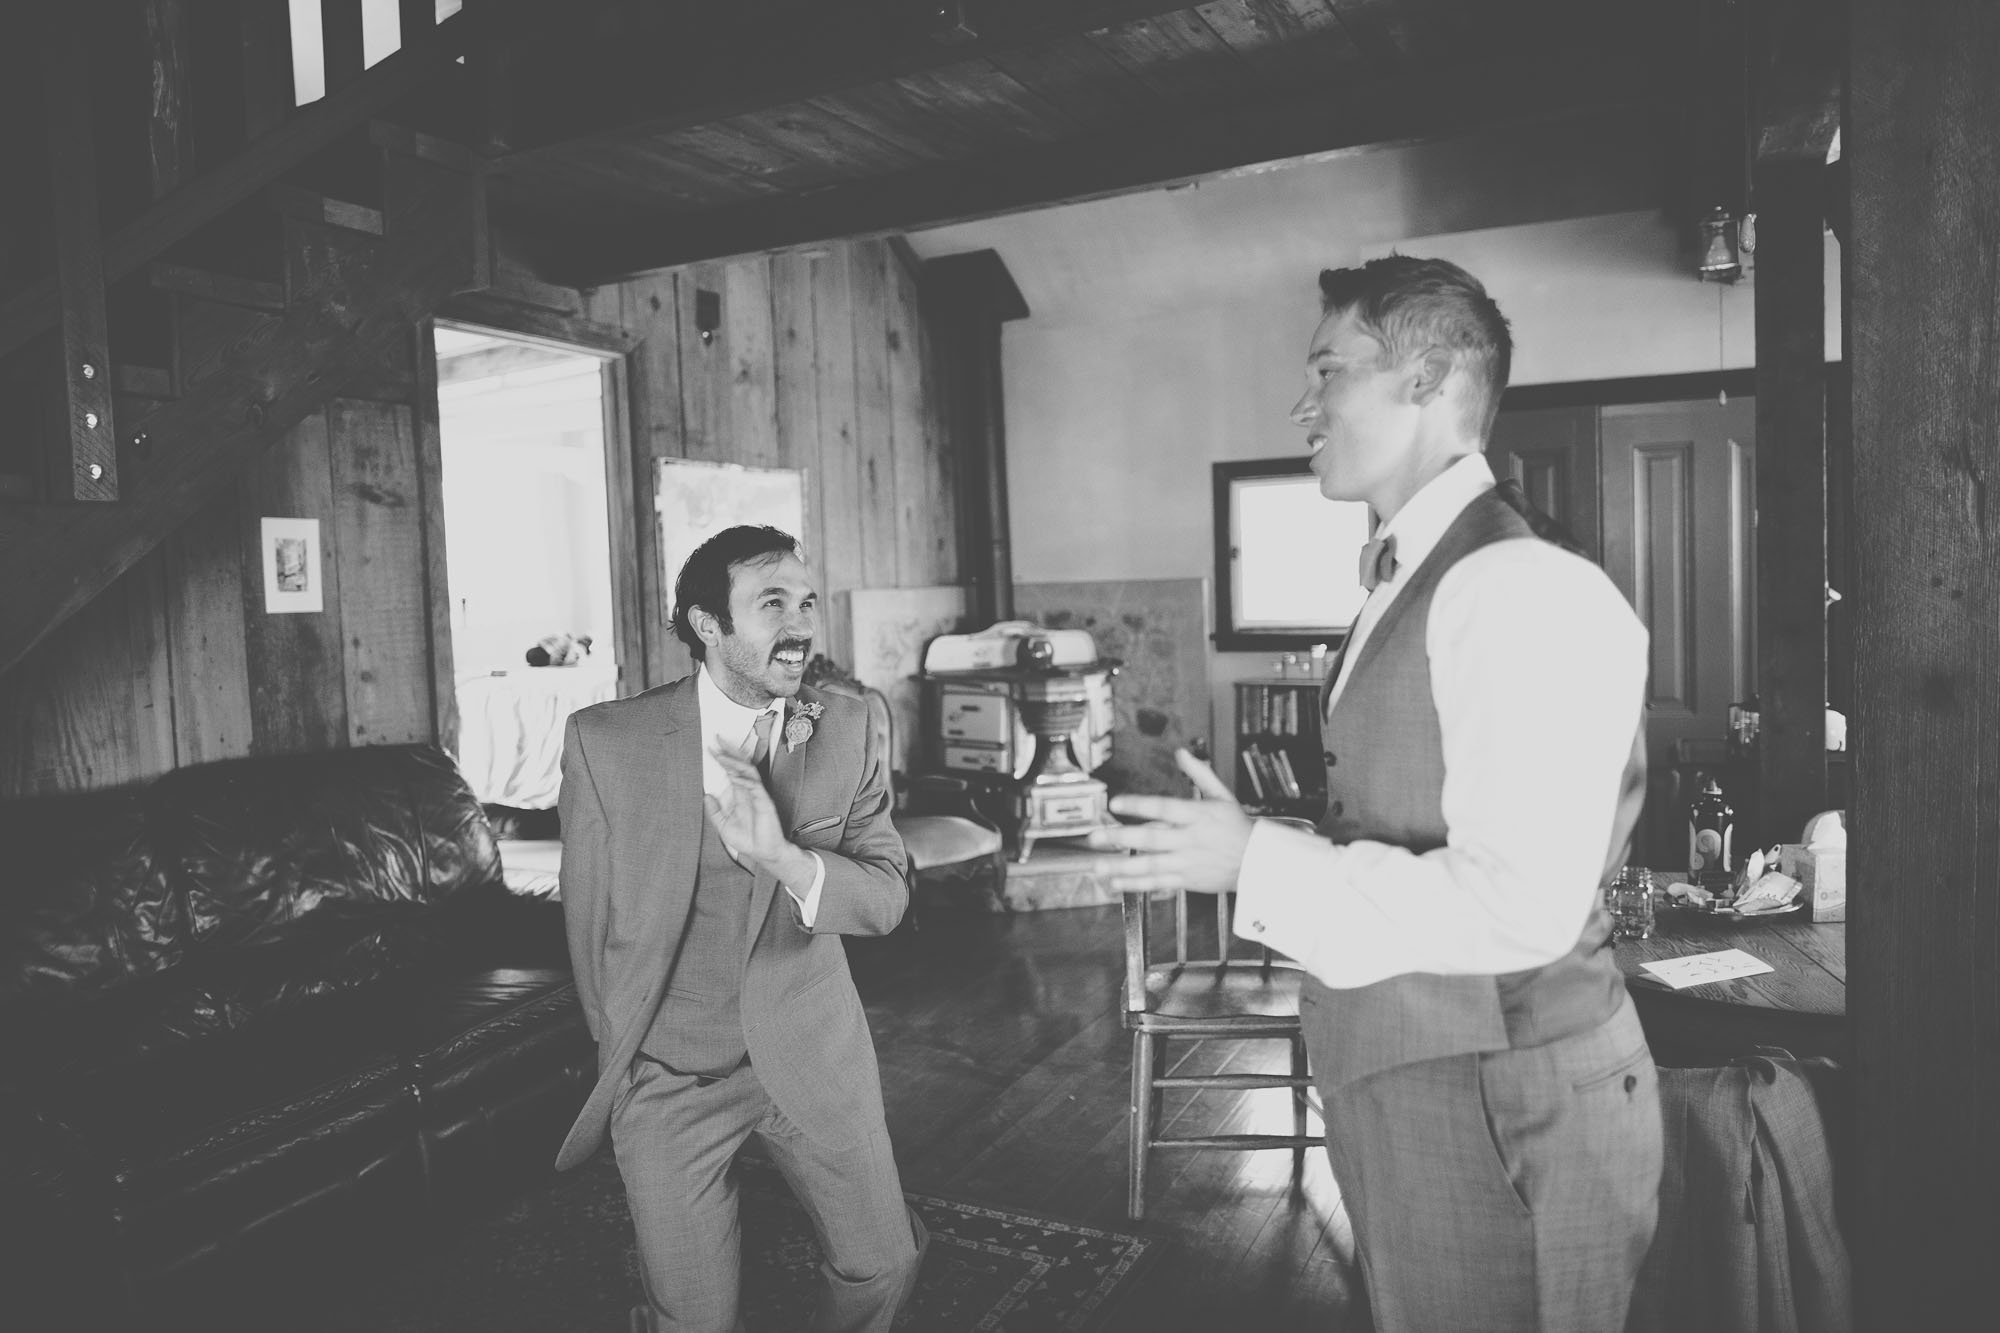 Gretchen_Gause_Petaluma_Olympias_Valley_Wedding_Photo-084.jpg